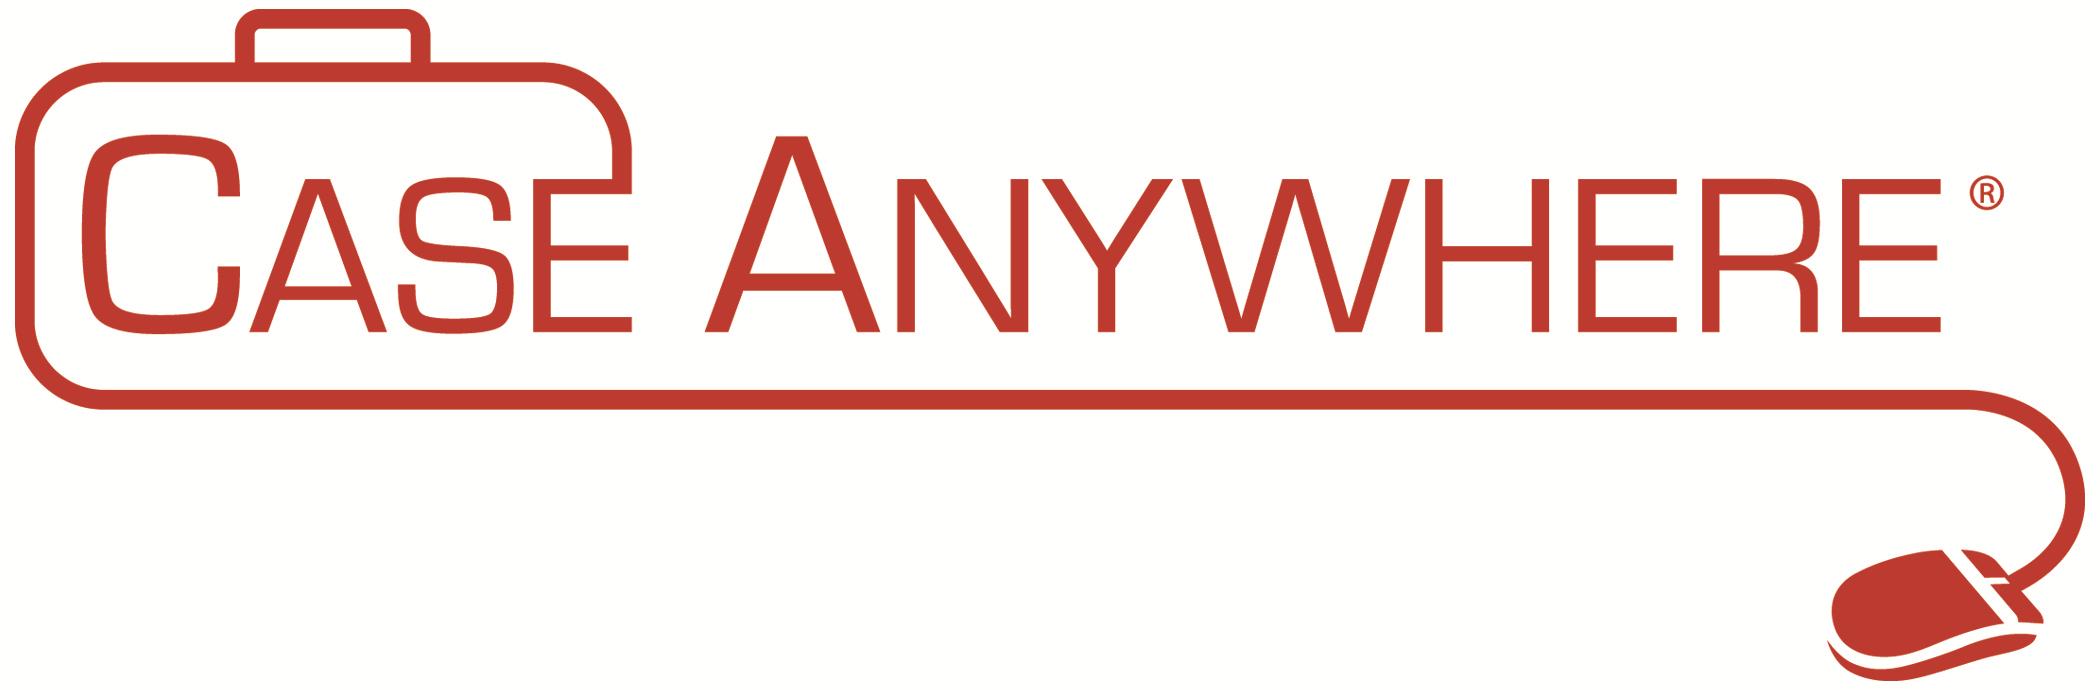 CaseAnywhere-logo-300dpi (1)